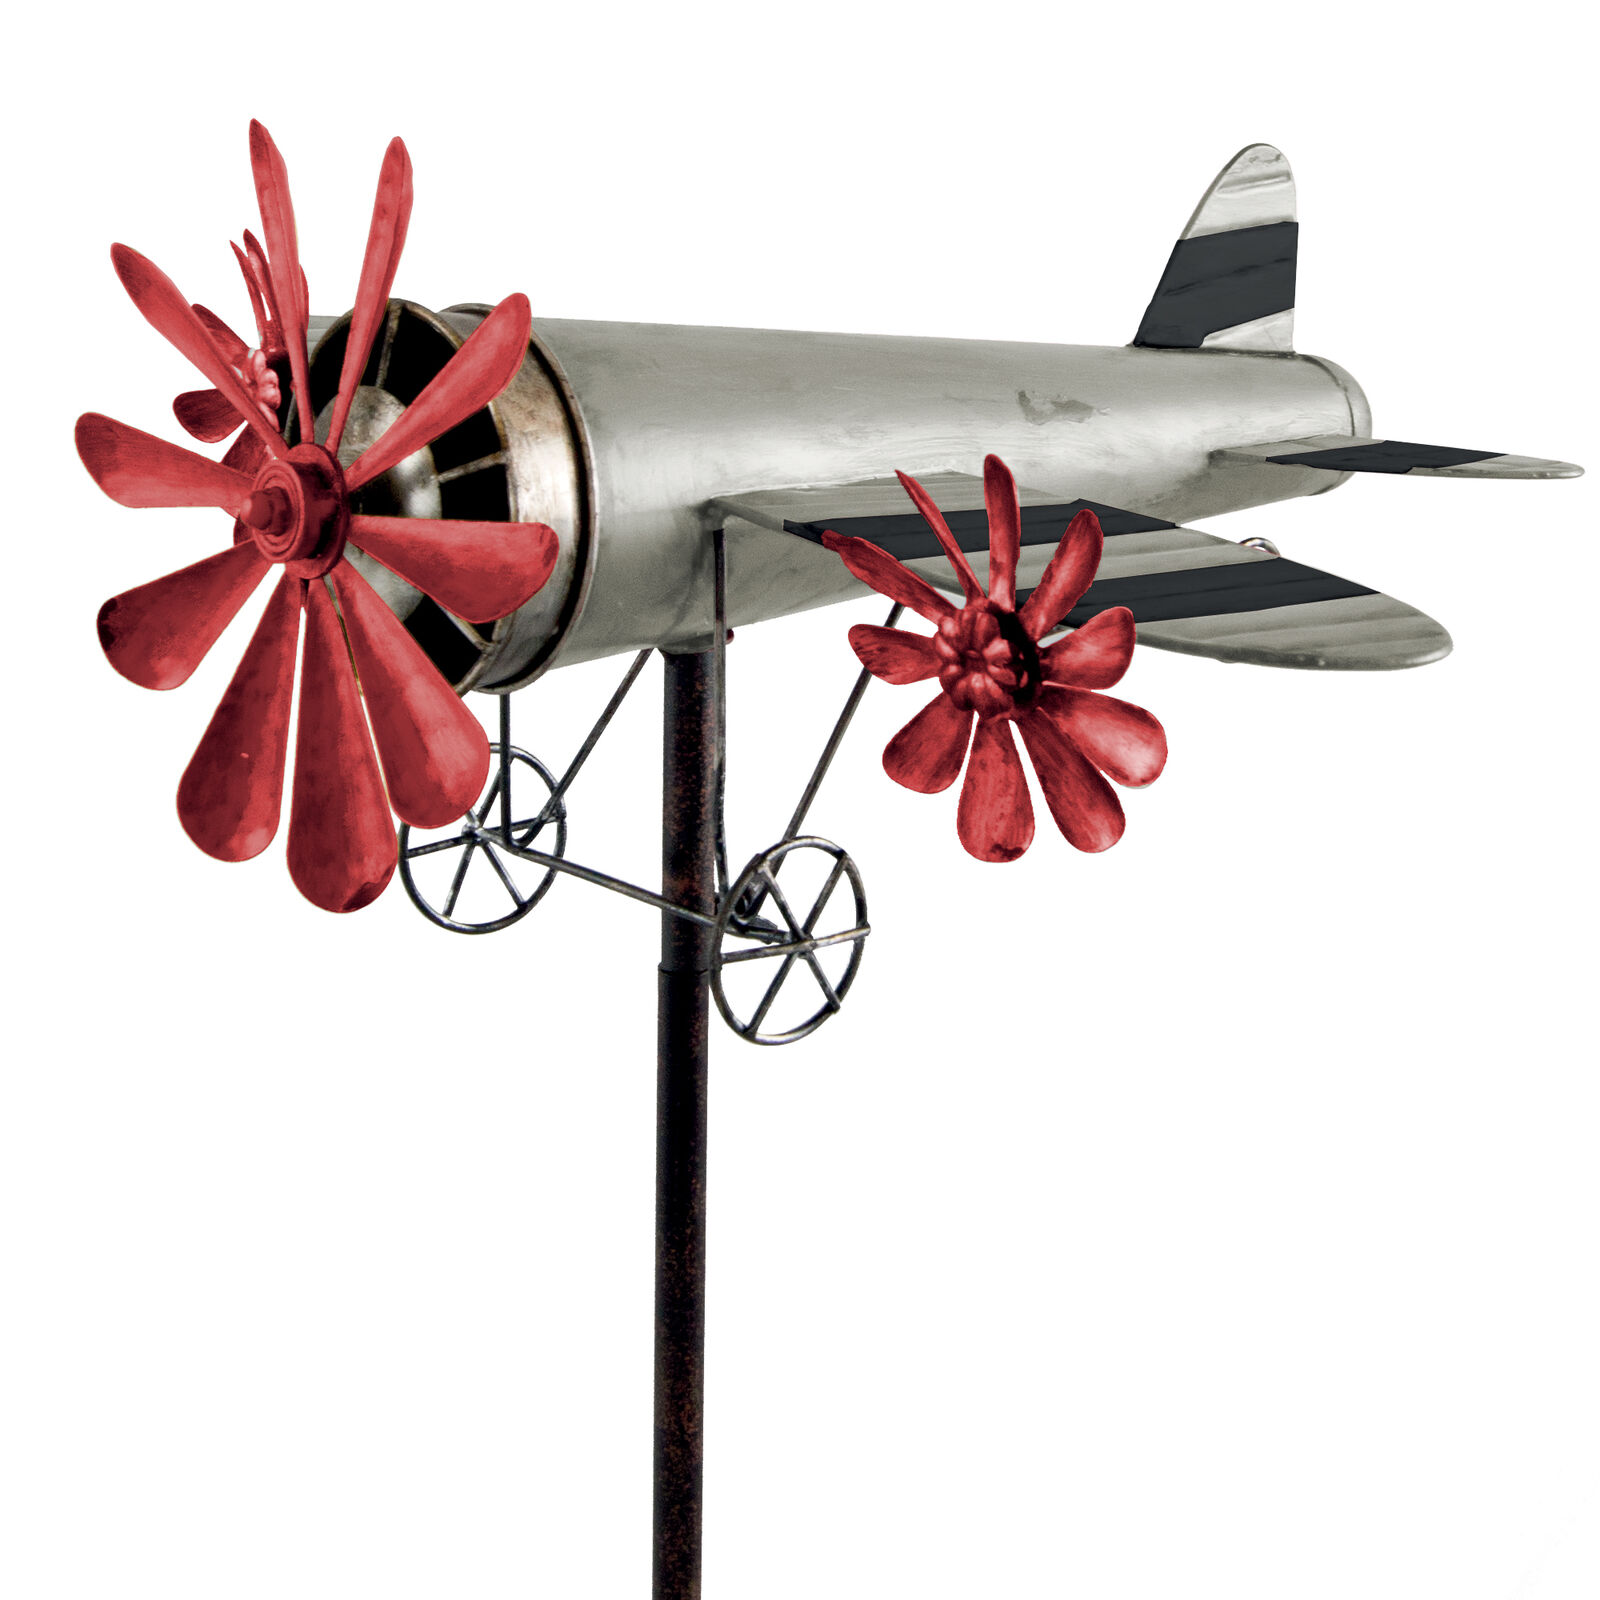 Windspiel Flugzeug Metall-Windrad ROSINENBOMBER Silber-Rot Gartendeko | 2019  | Internationale Wahl  | Vogue